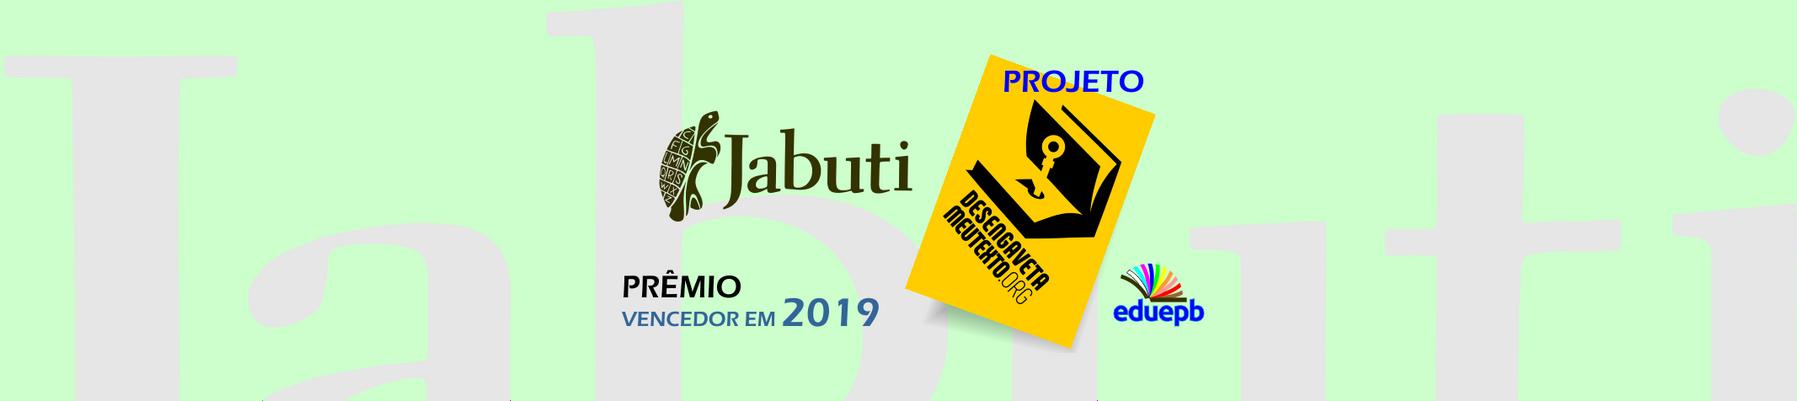 JABUTI 7.png